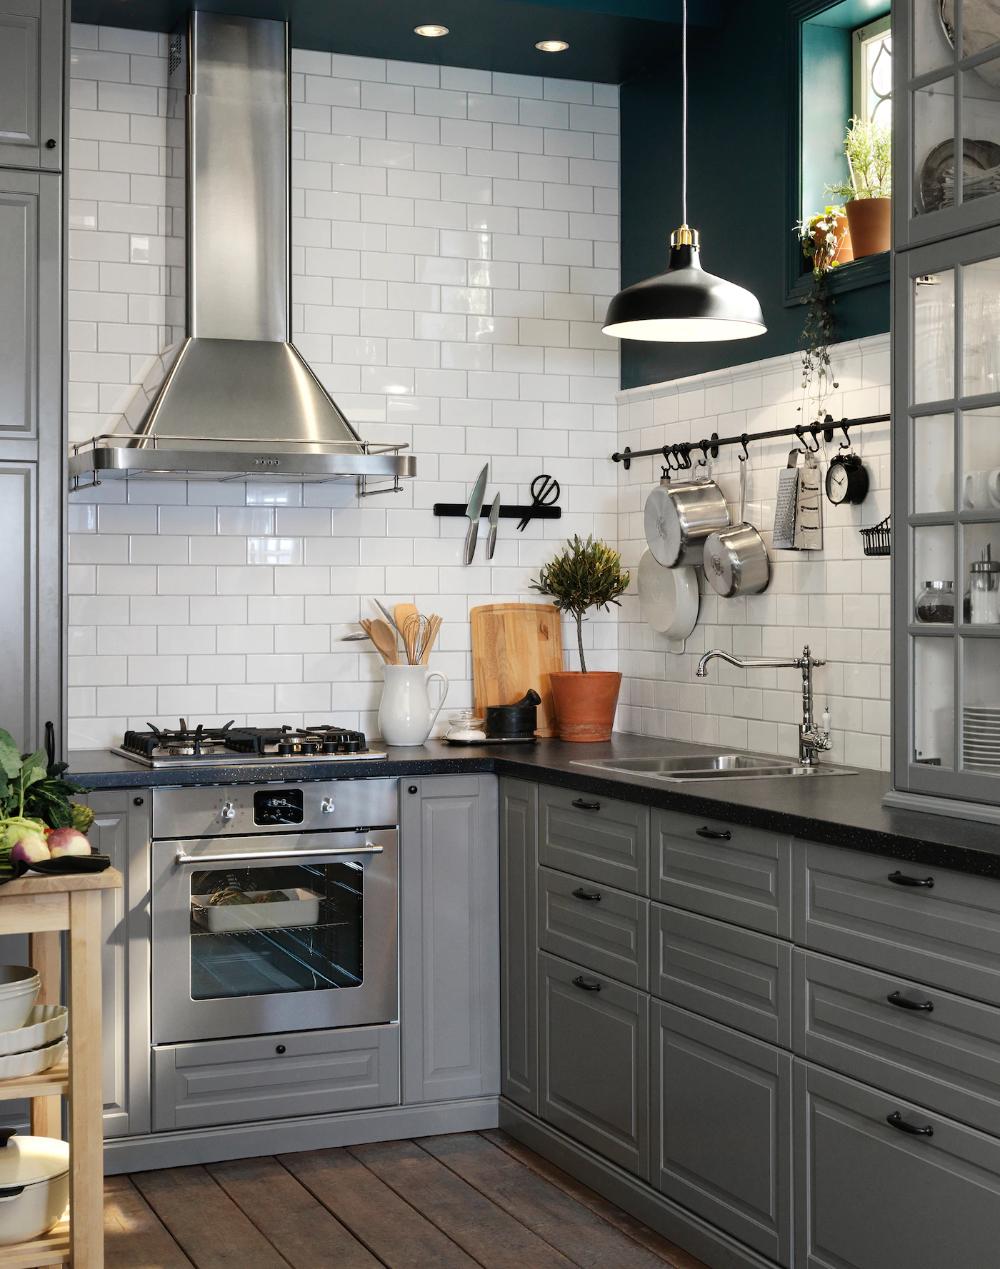 Seria Bodbyn Kitchen Remodel Kitchen Remodel Small Ikea Bodbyn Kitchen